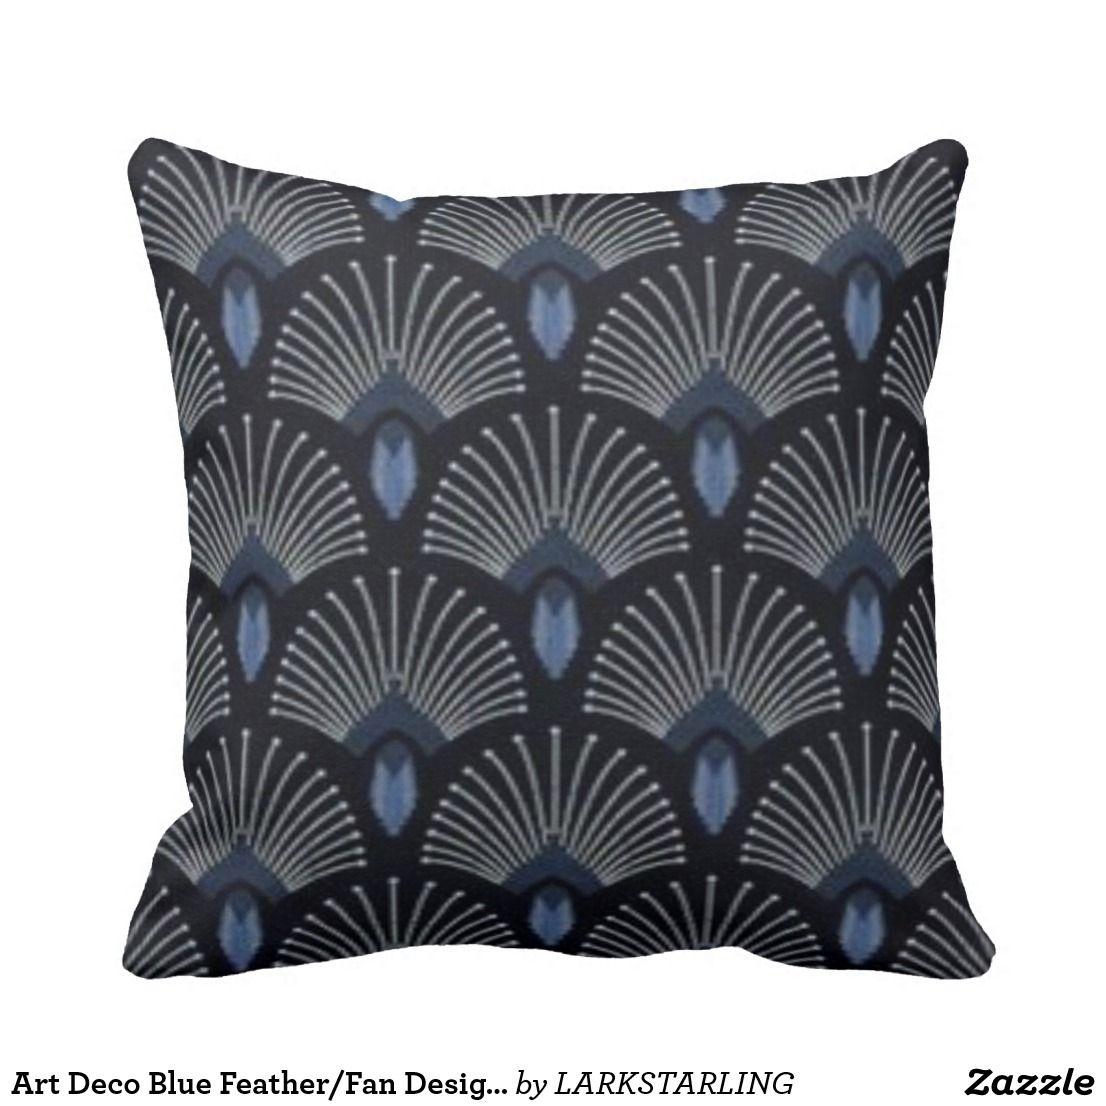 Art Deco Blue FeatherFan Design Throw Pillow